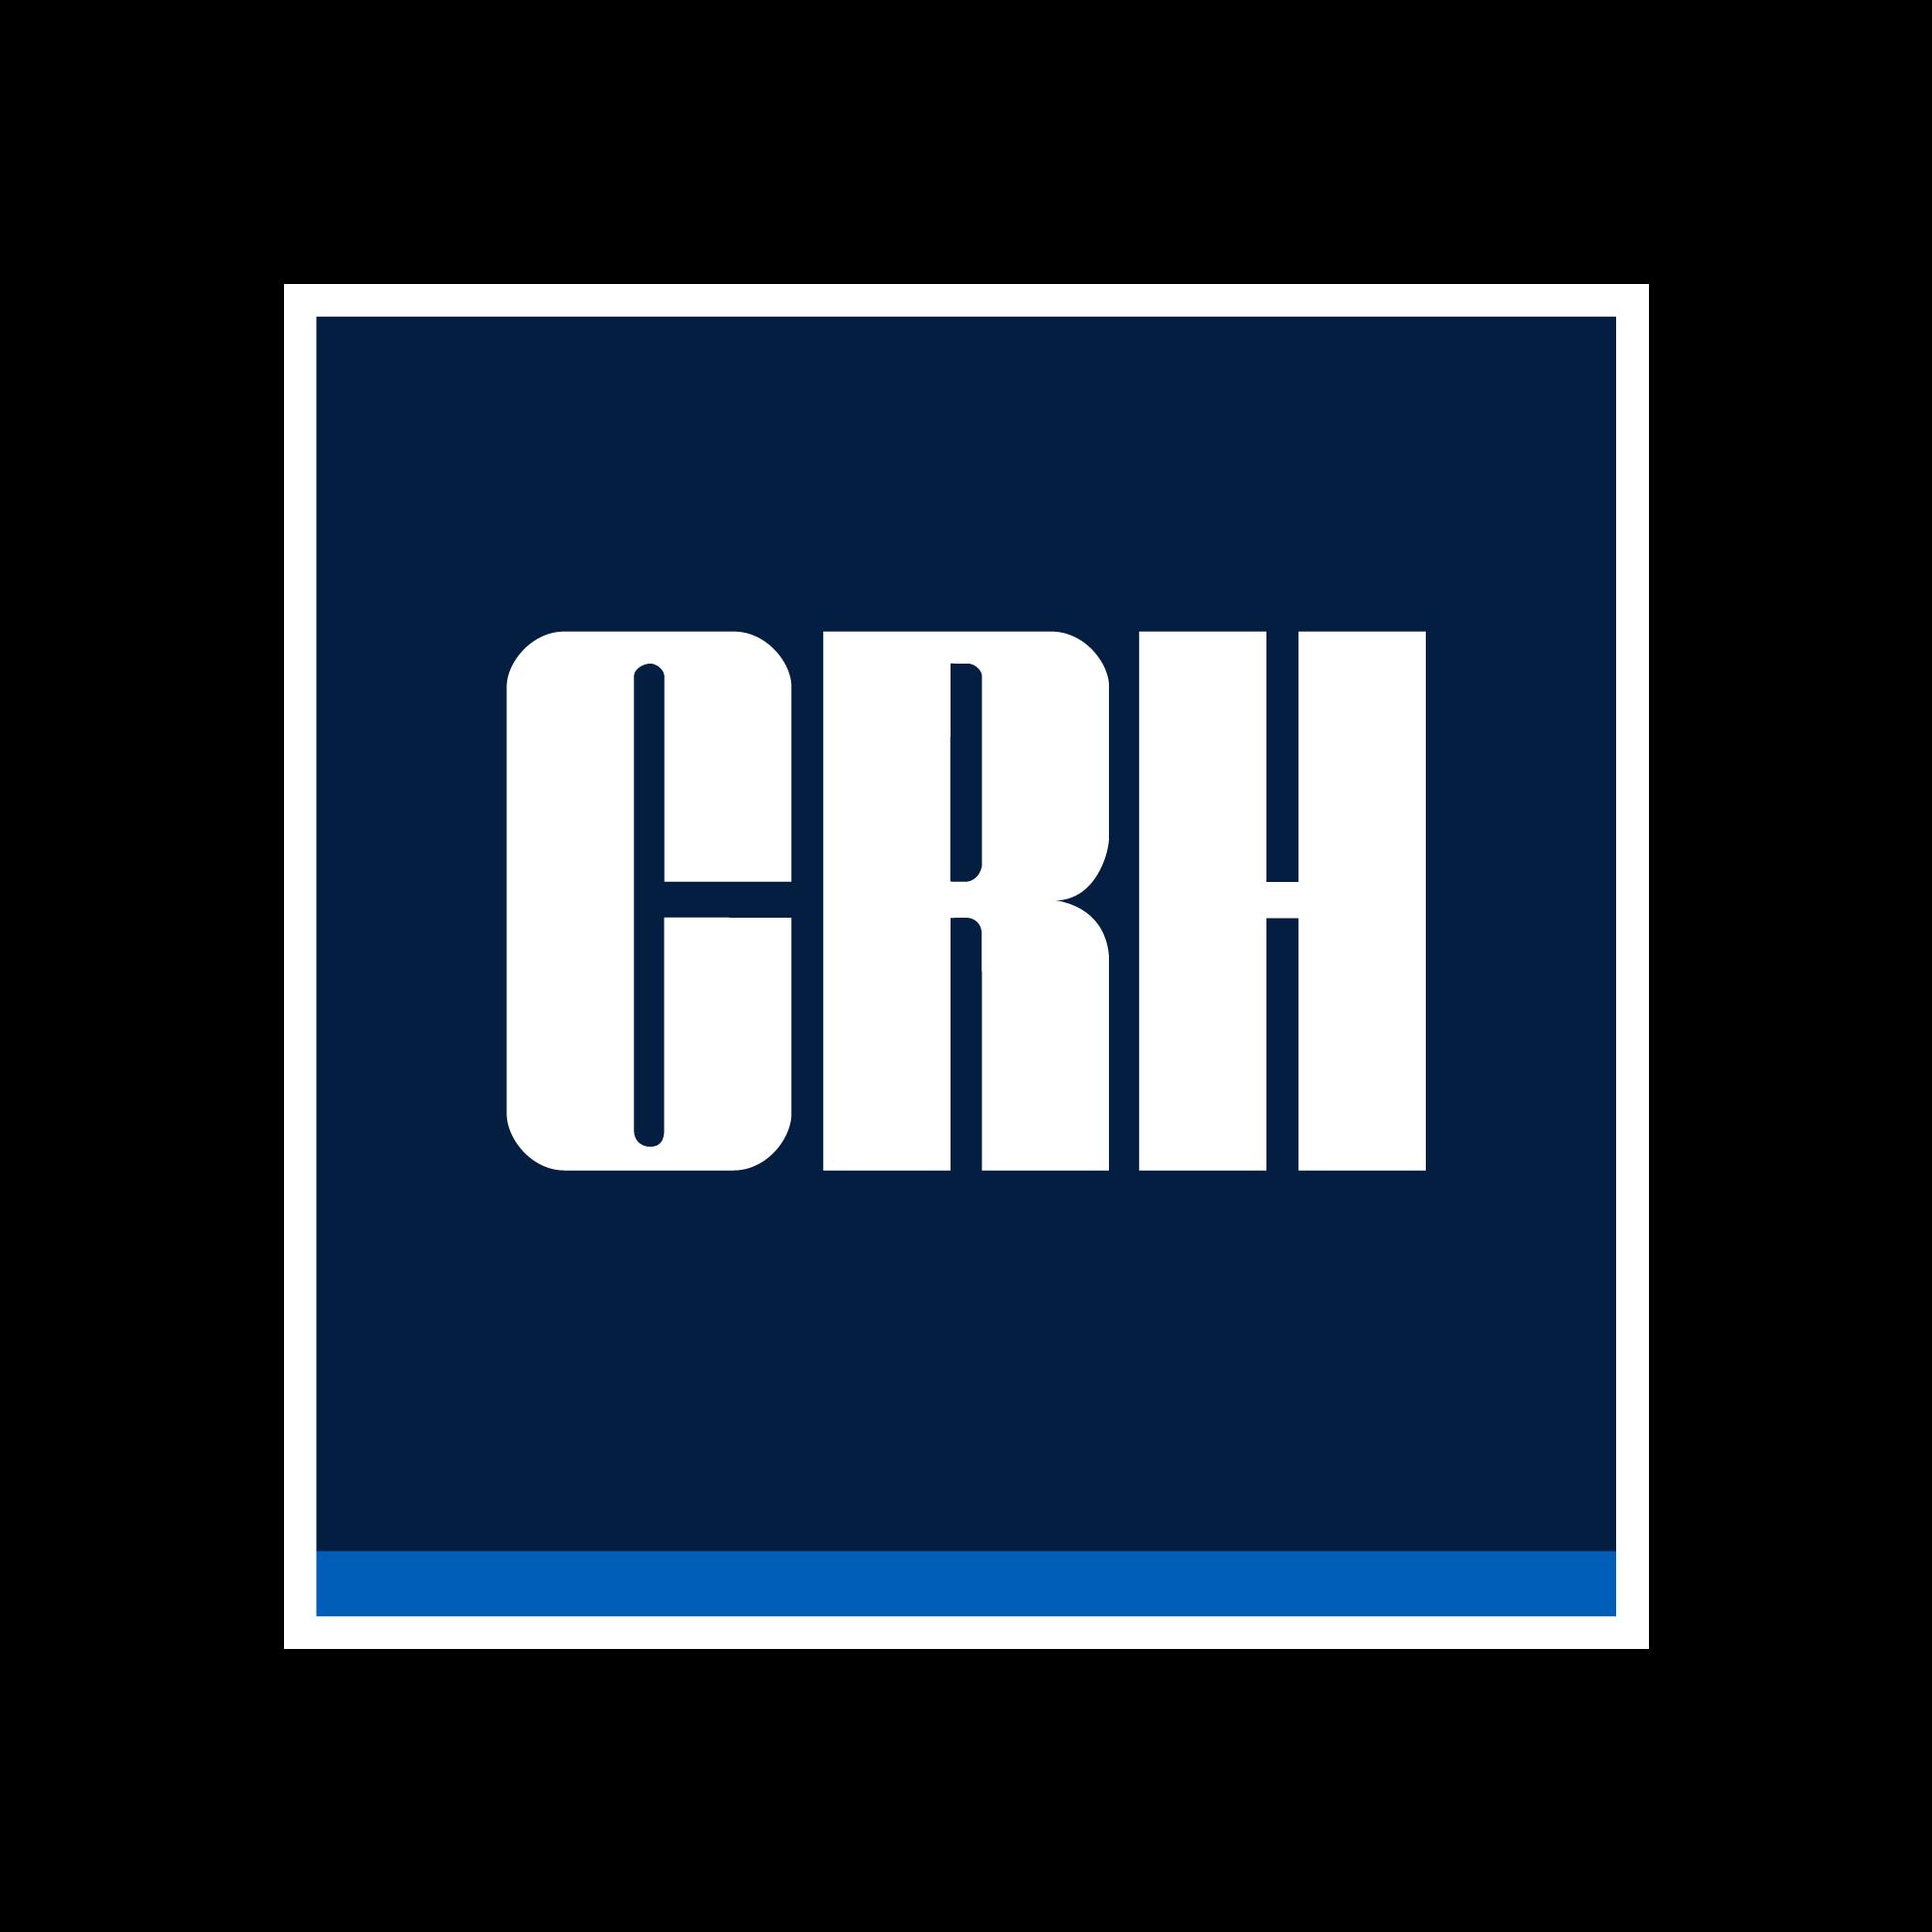 CRH's logo